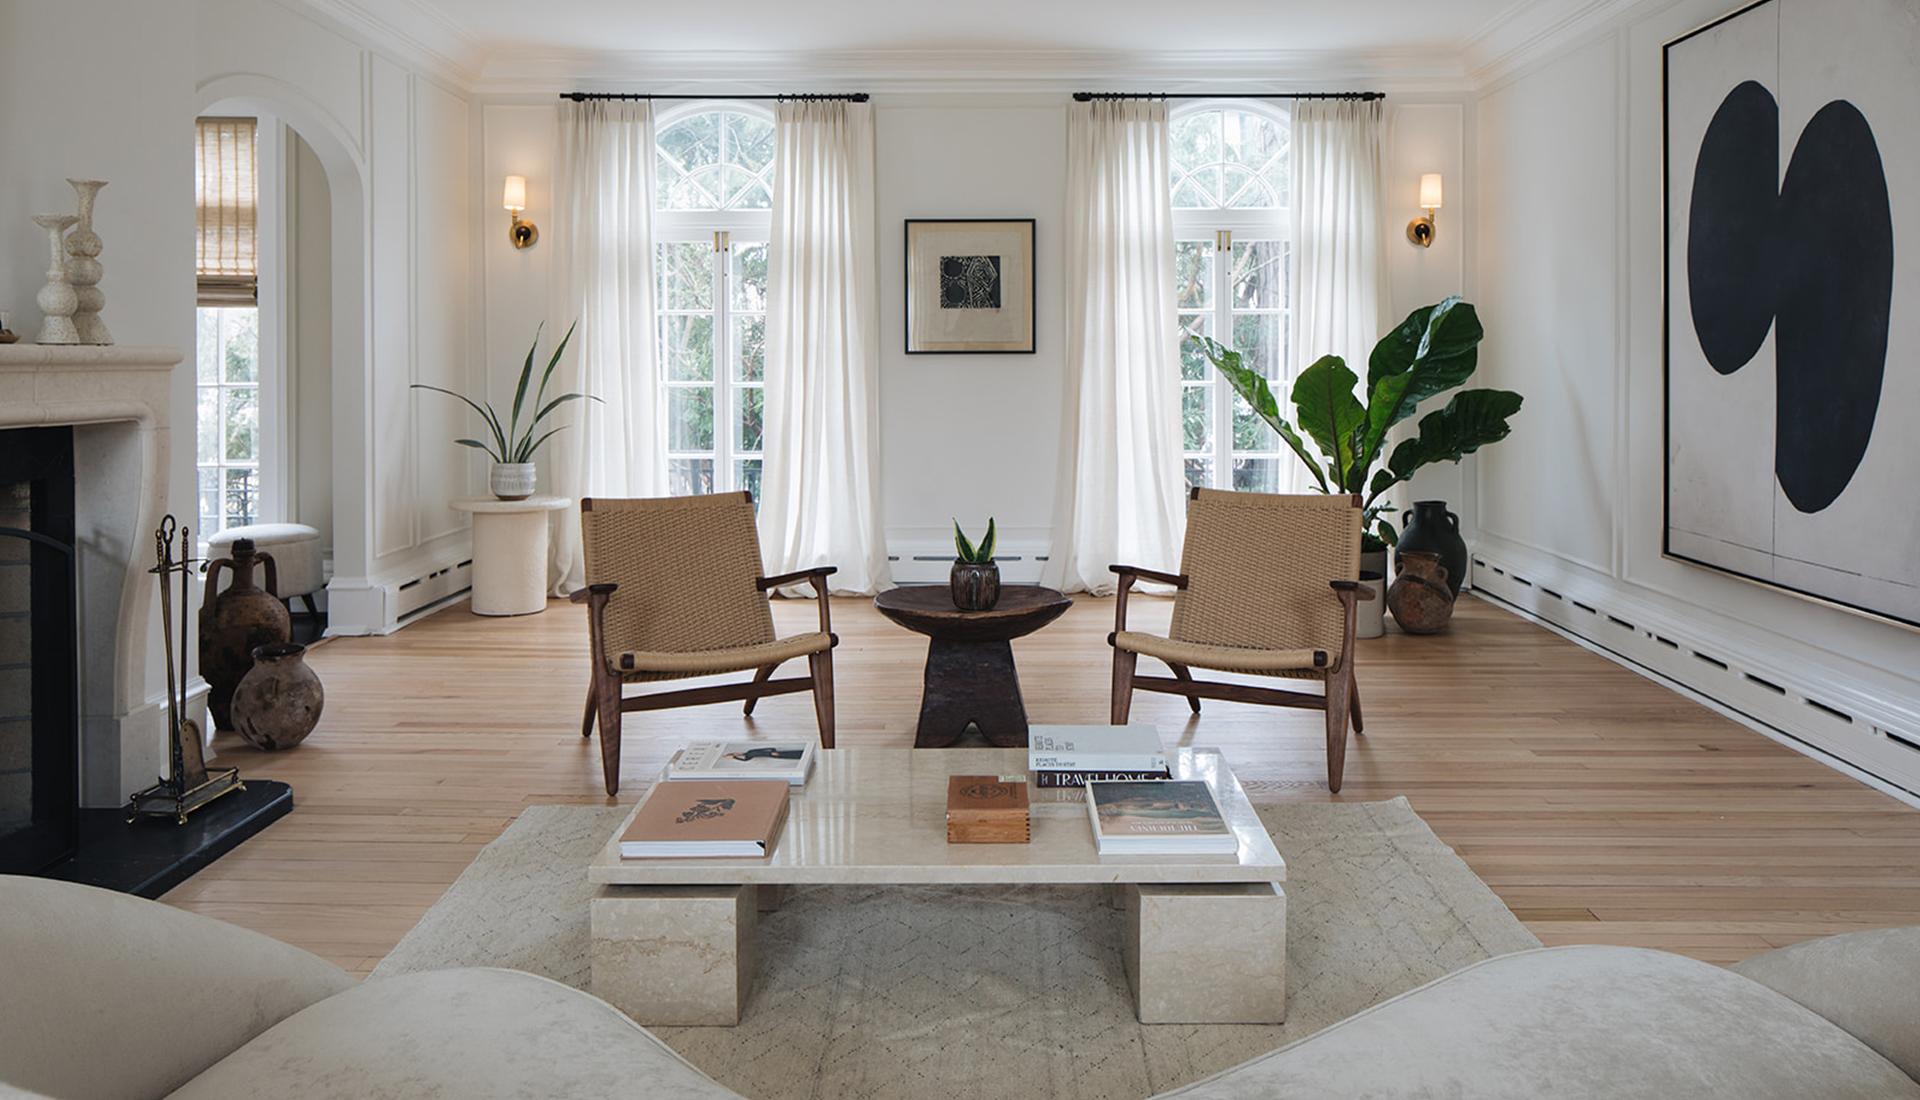 Pernille Lind Studio: реконструкция дома начала XX века в Чикаго